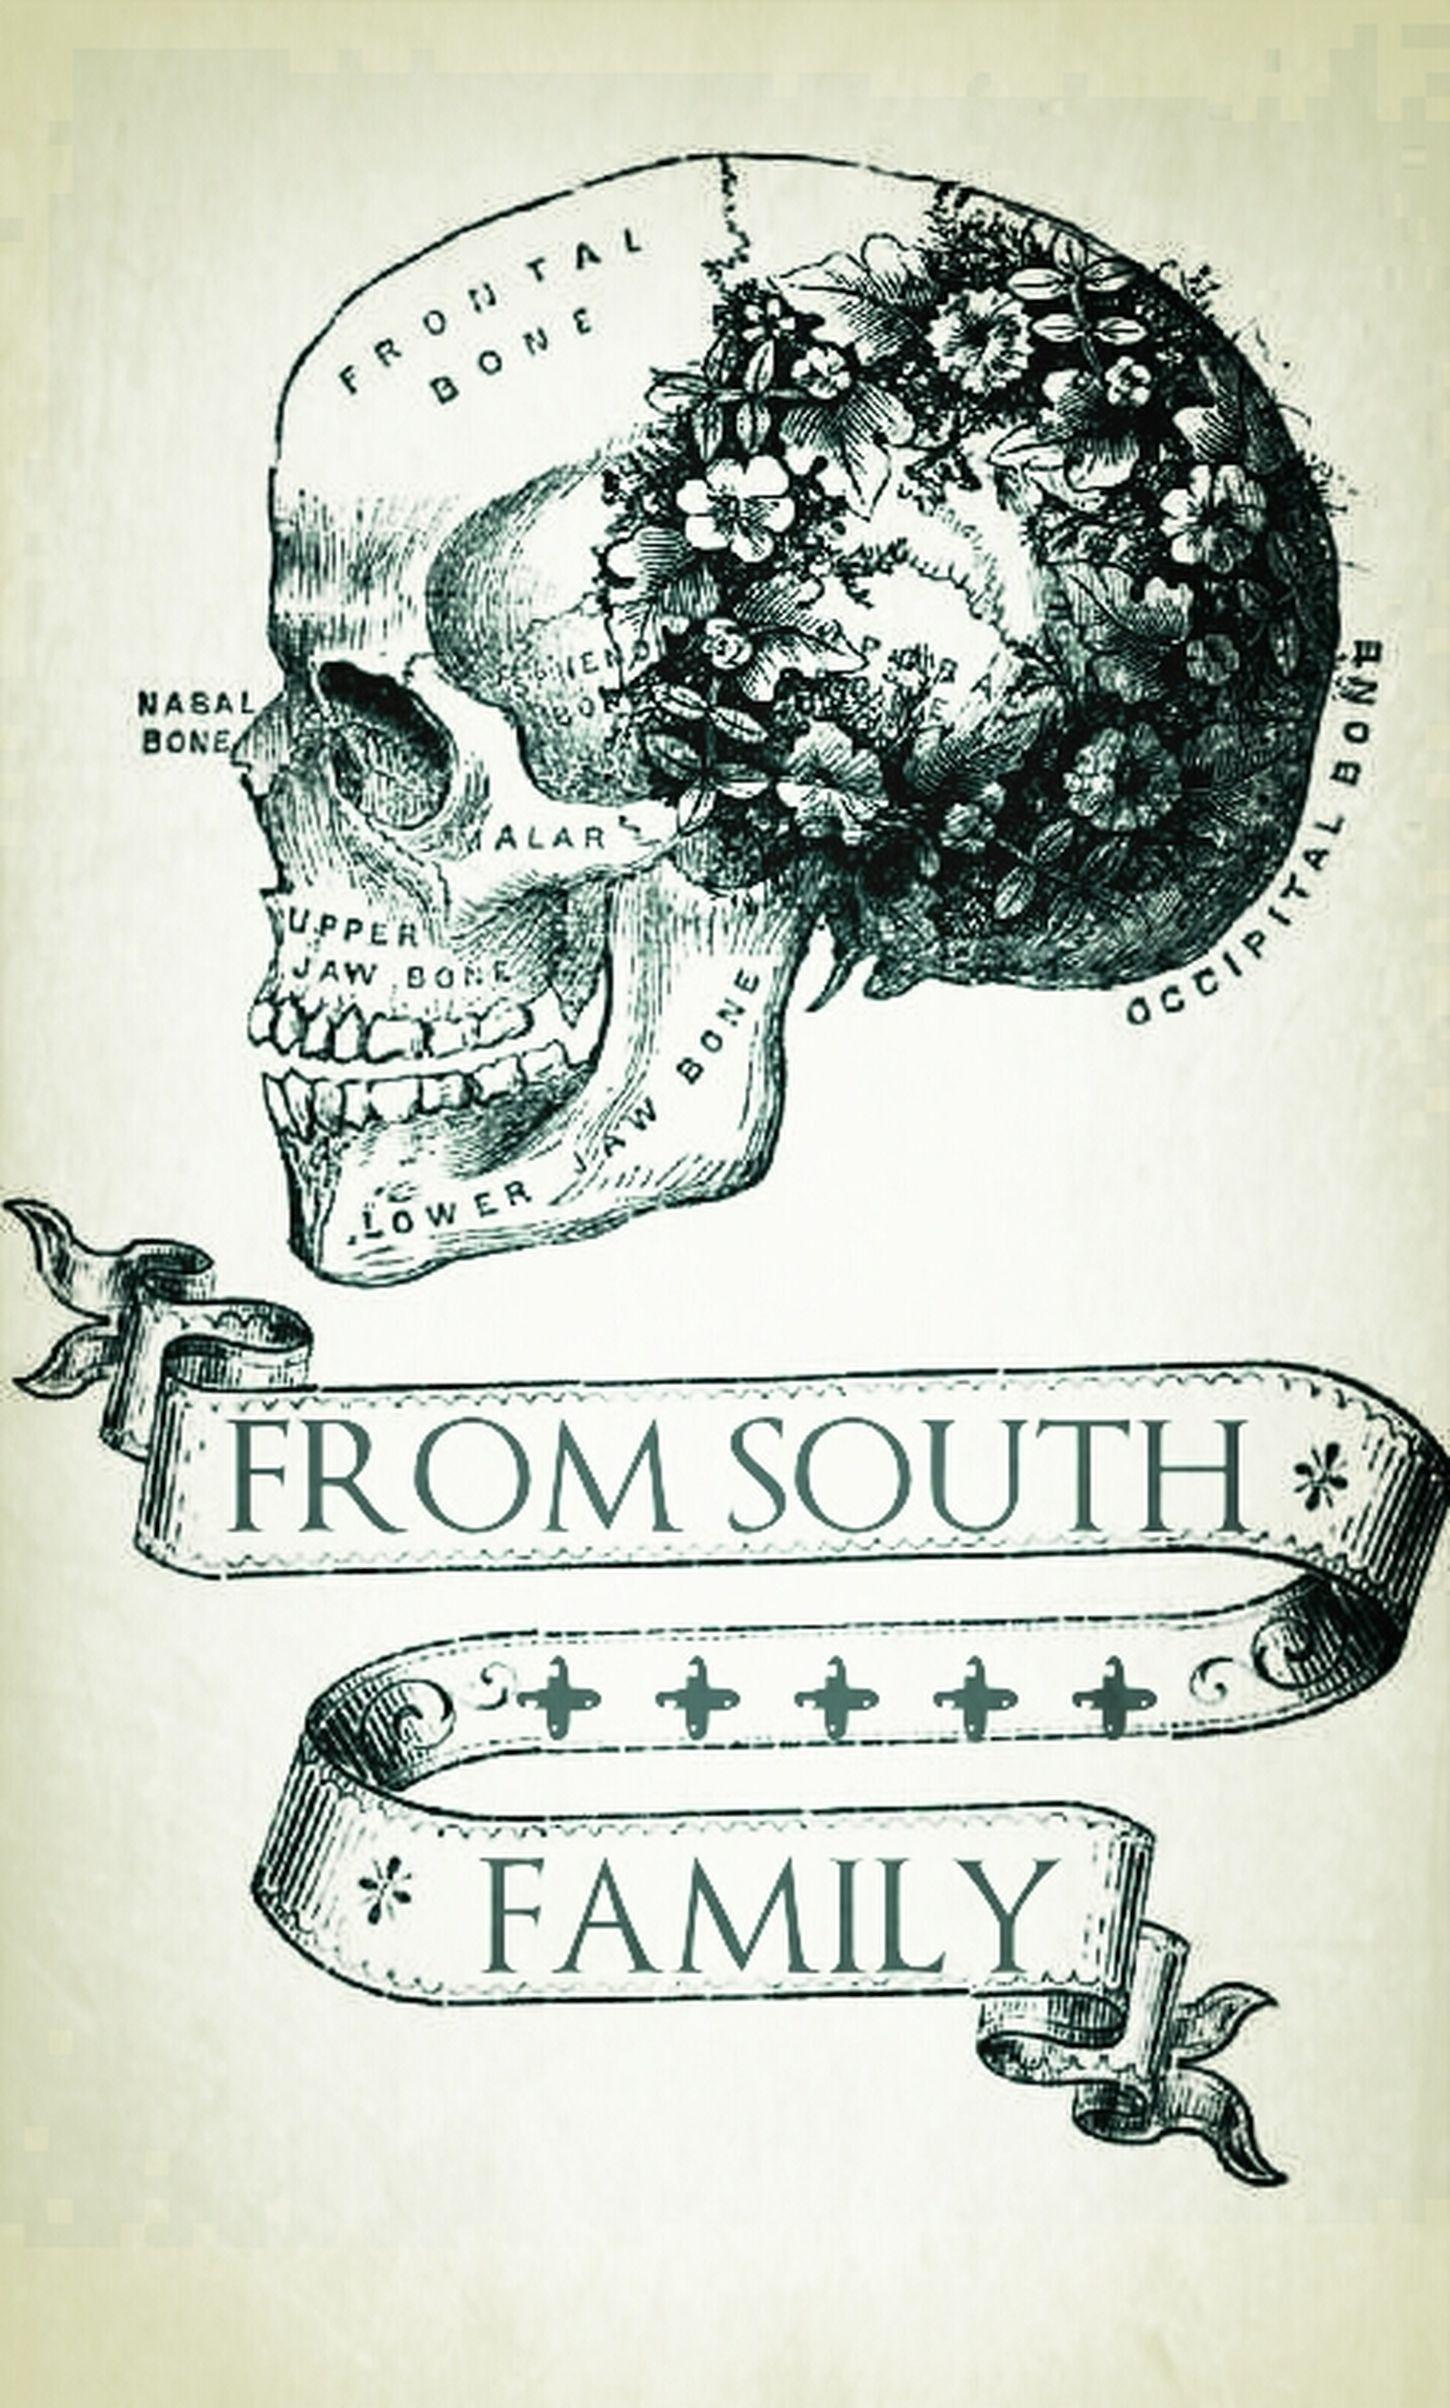 Fromsouthfamily Art Swag Logo